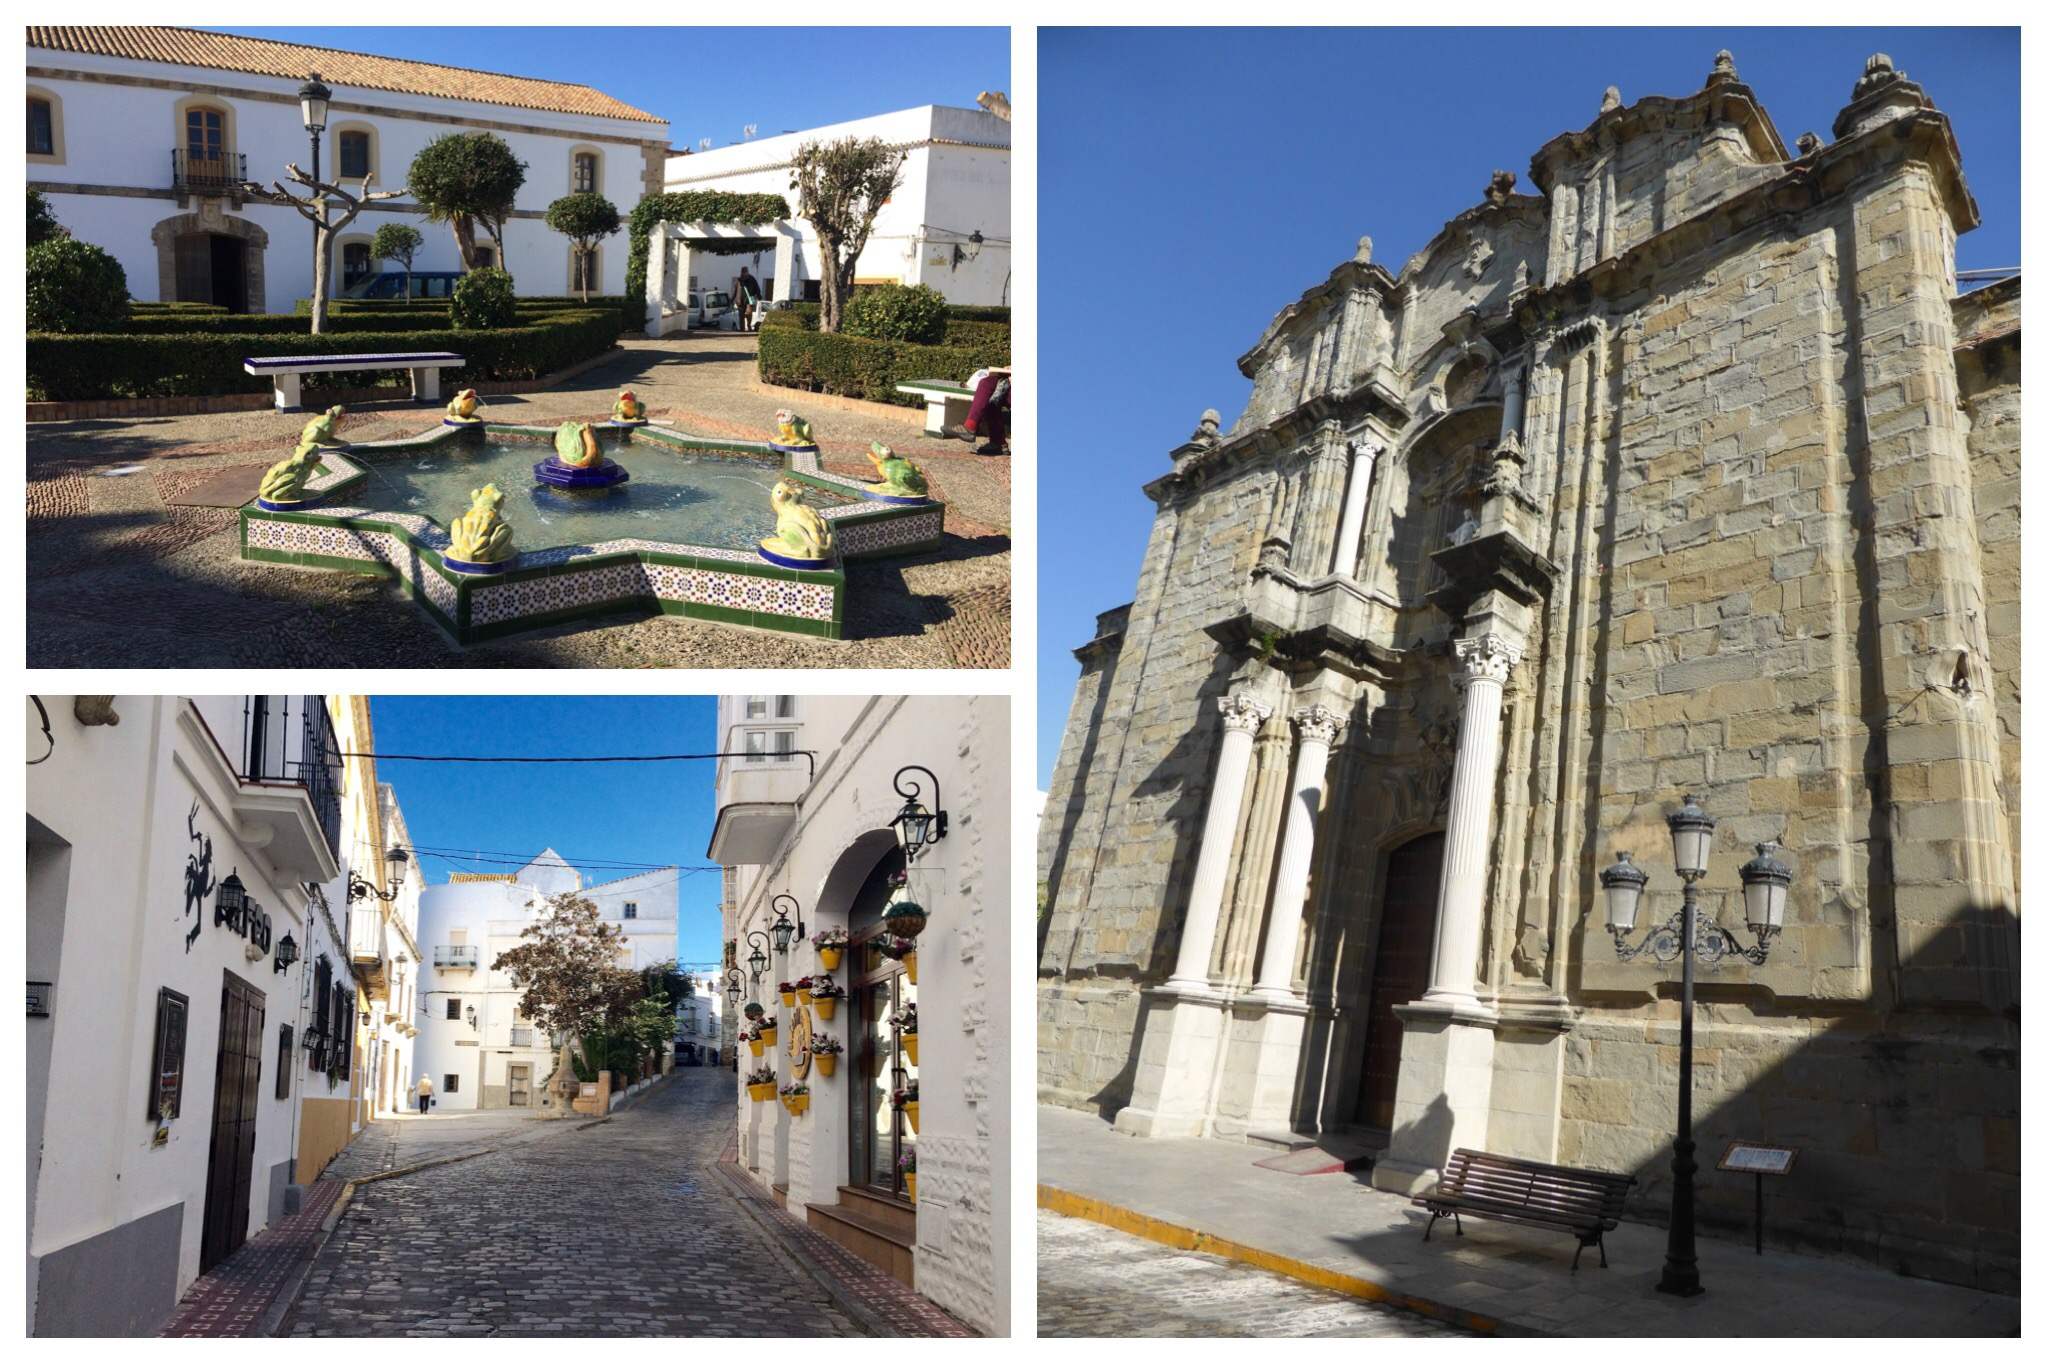 Tarifa - Plaza Santa Maria, Iglesia San Mateo